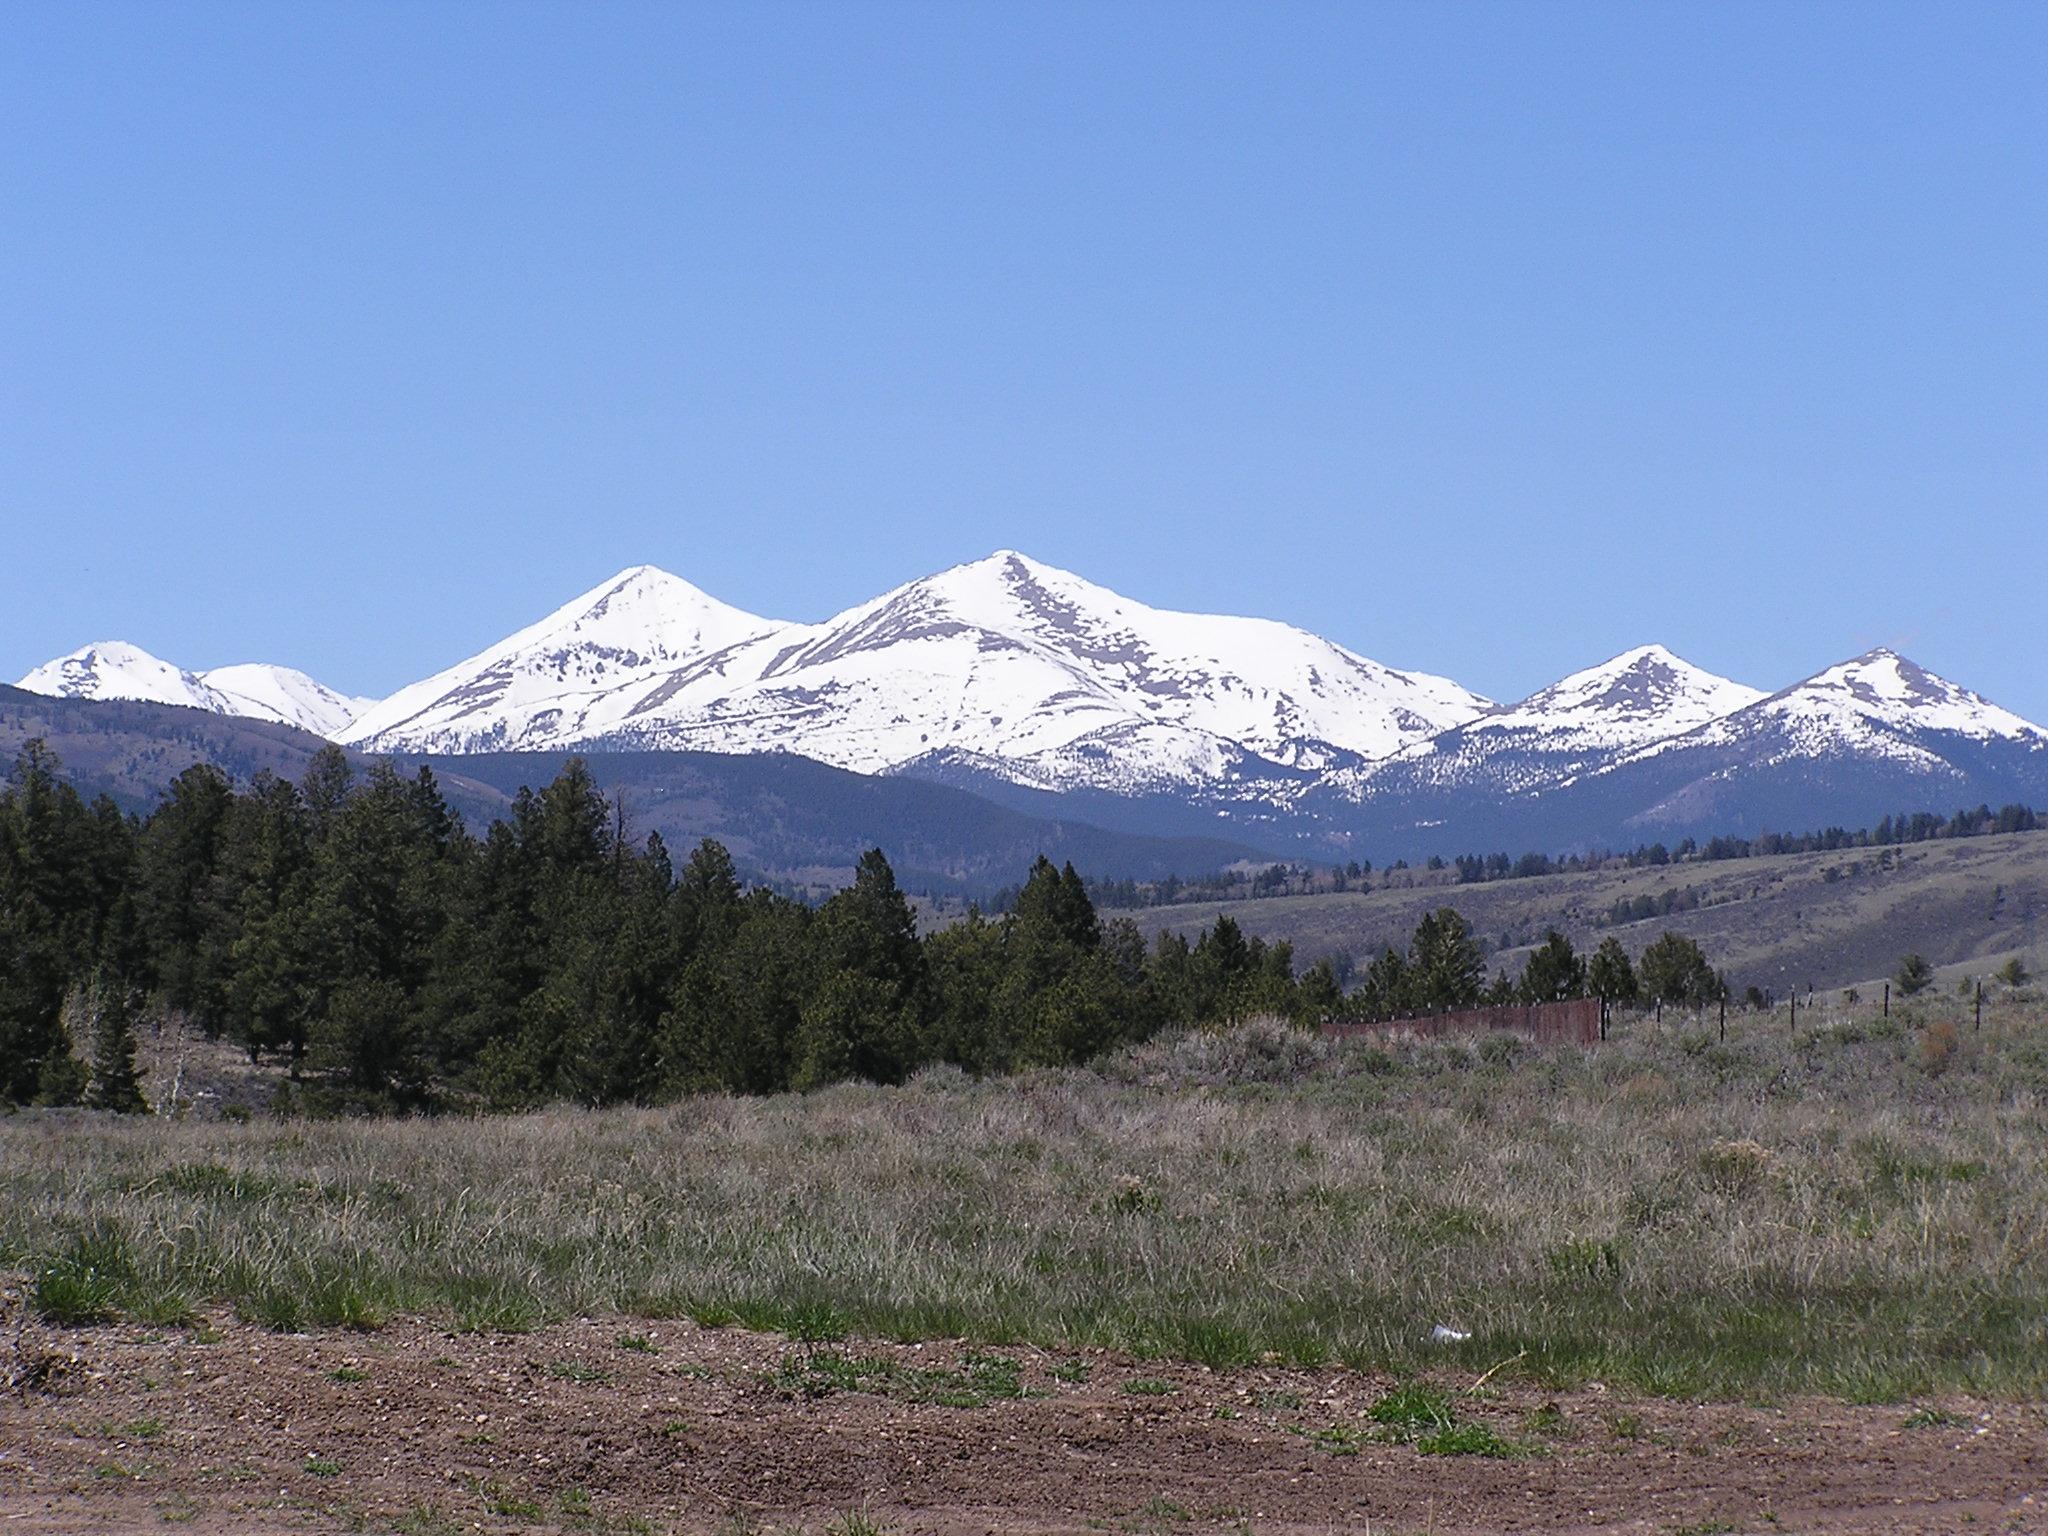 Hd Wallpaper Co File Mount Aetna Taylor Mountain Jpg Wikimedia Commons